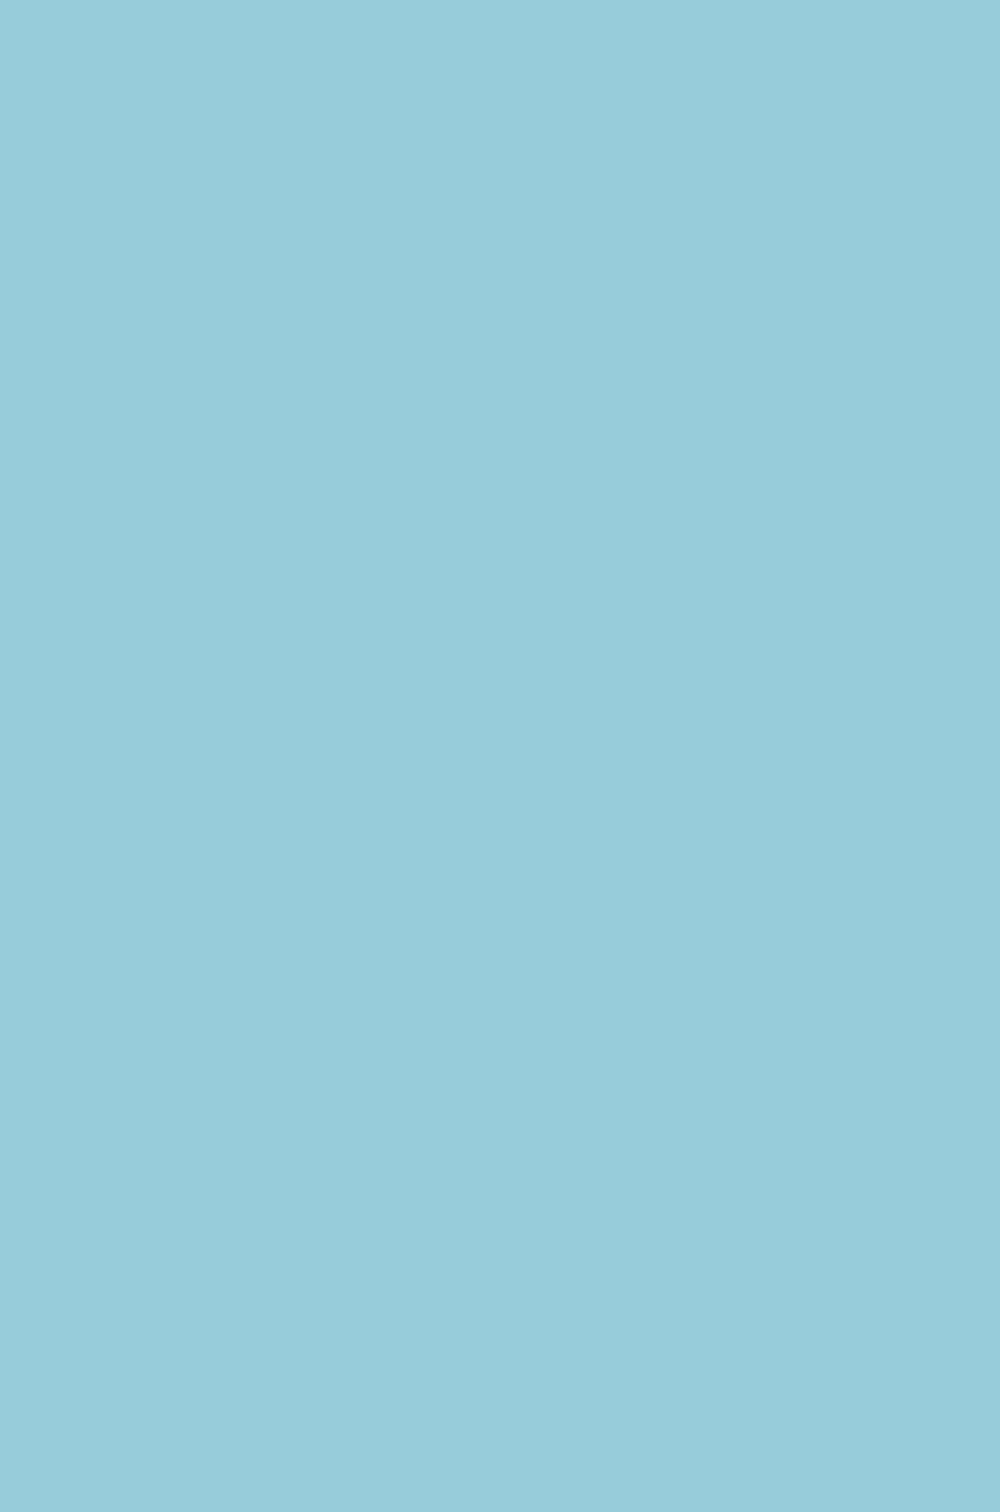 Blue Blank Page.jpg